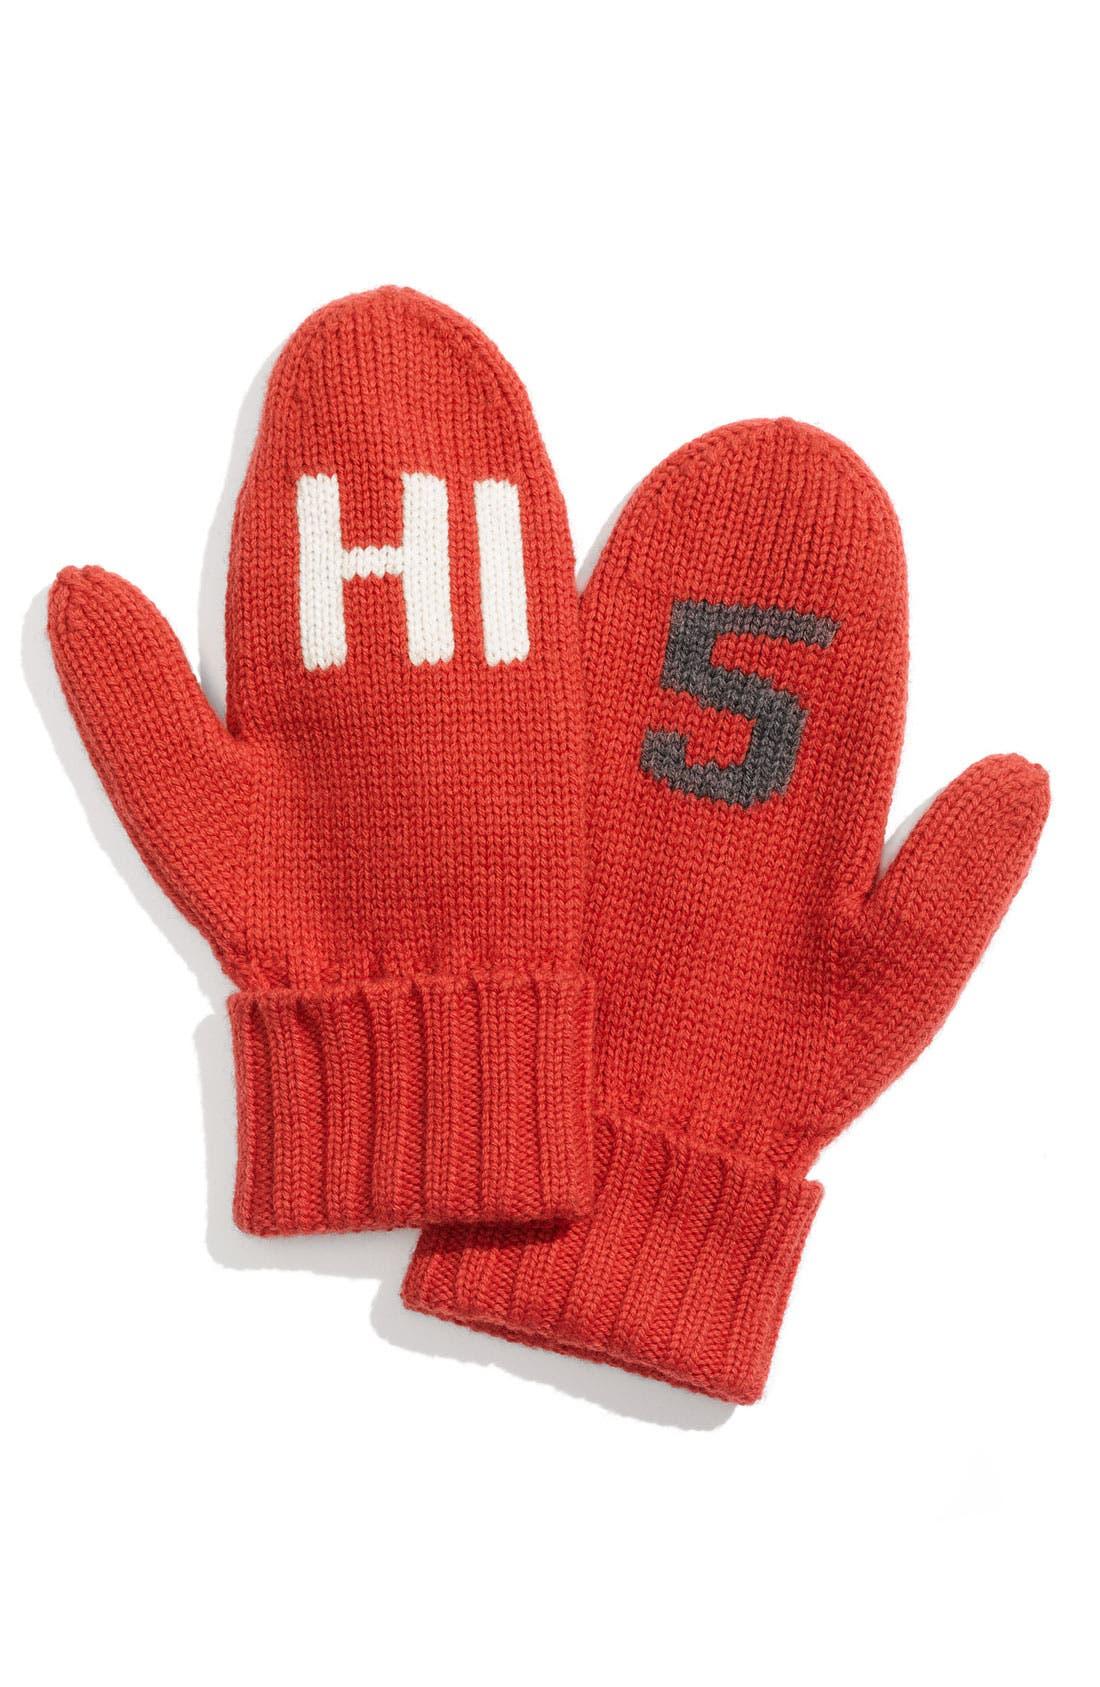 Alternate Image 1 Selected - kate spade new york 'hi 5' mittens